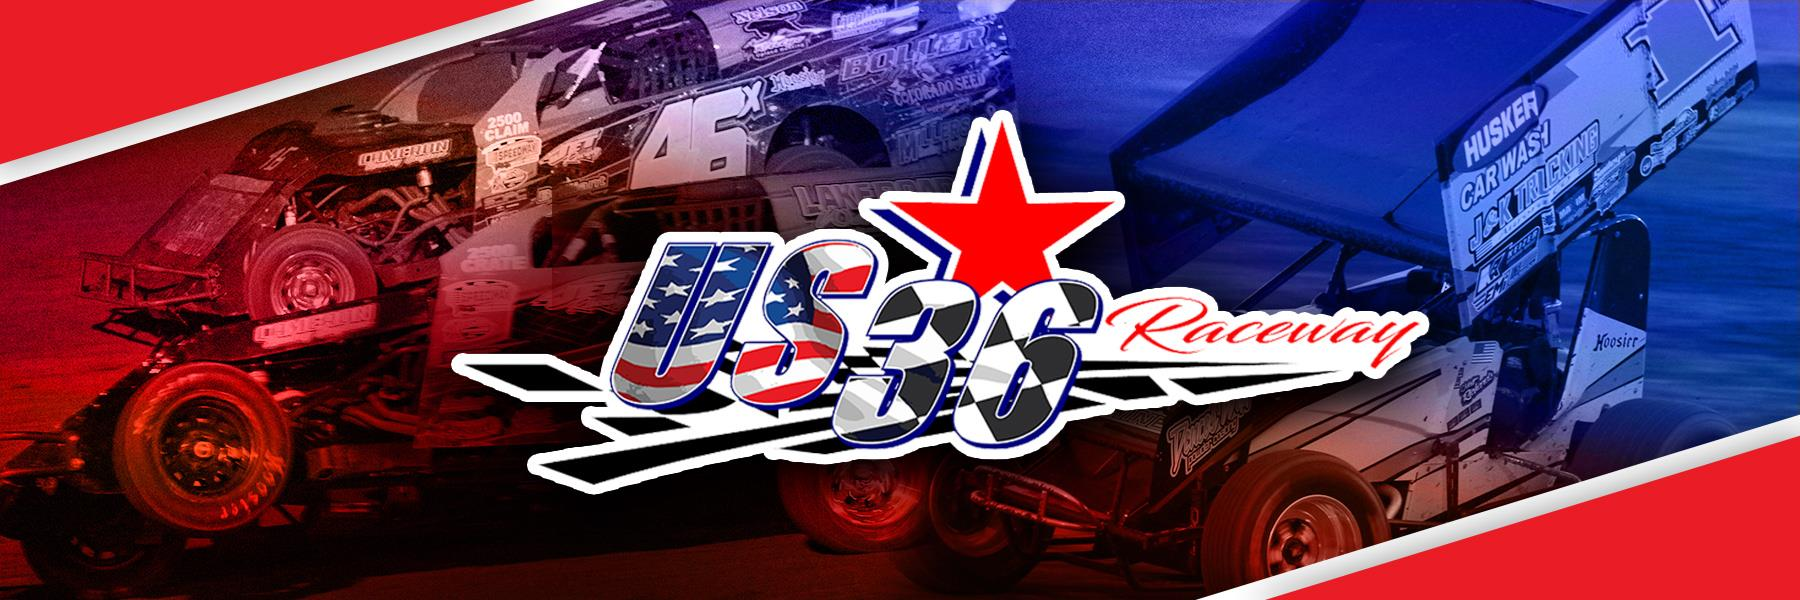 7/17/2020 - US 36 Raceway